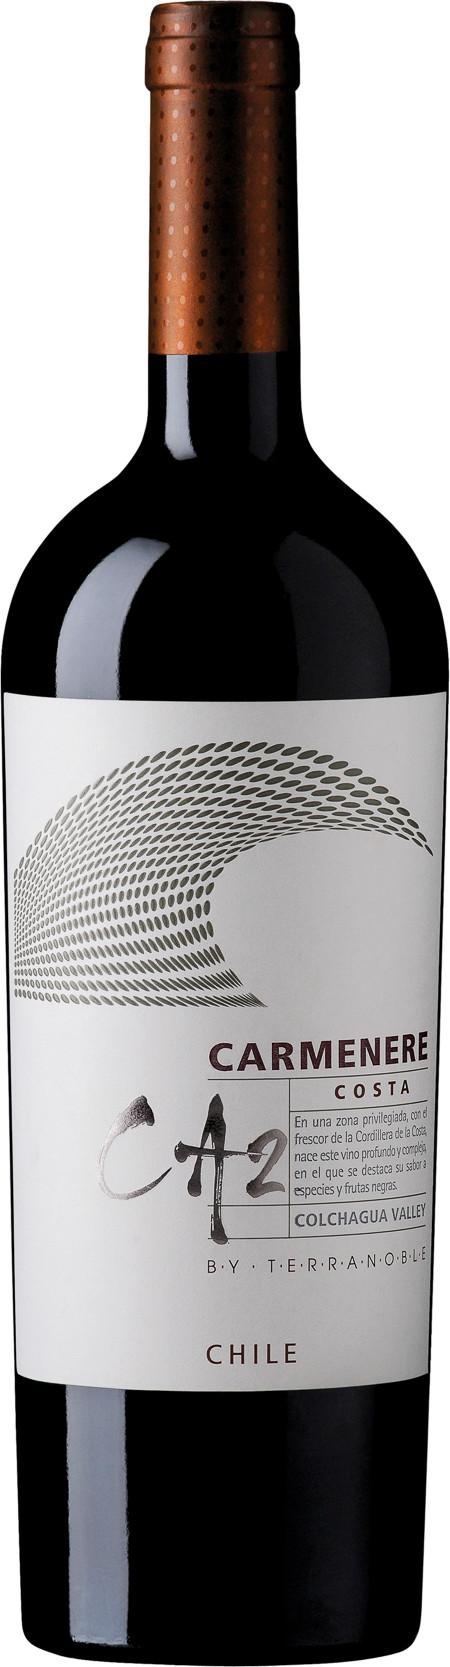 Terra Noble- Premium Carmenere Costa